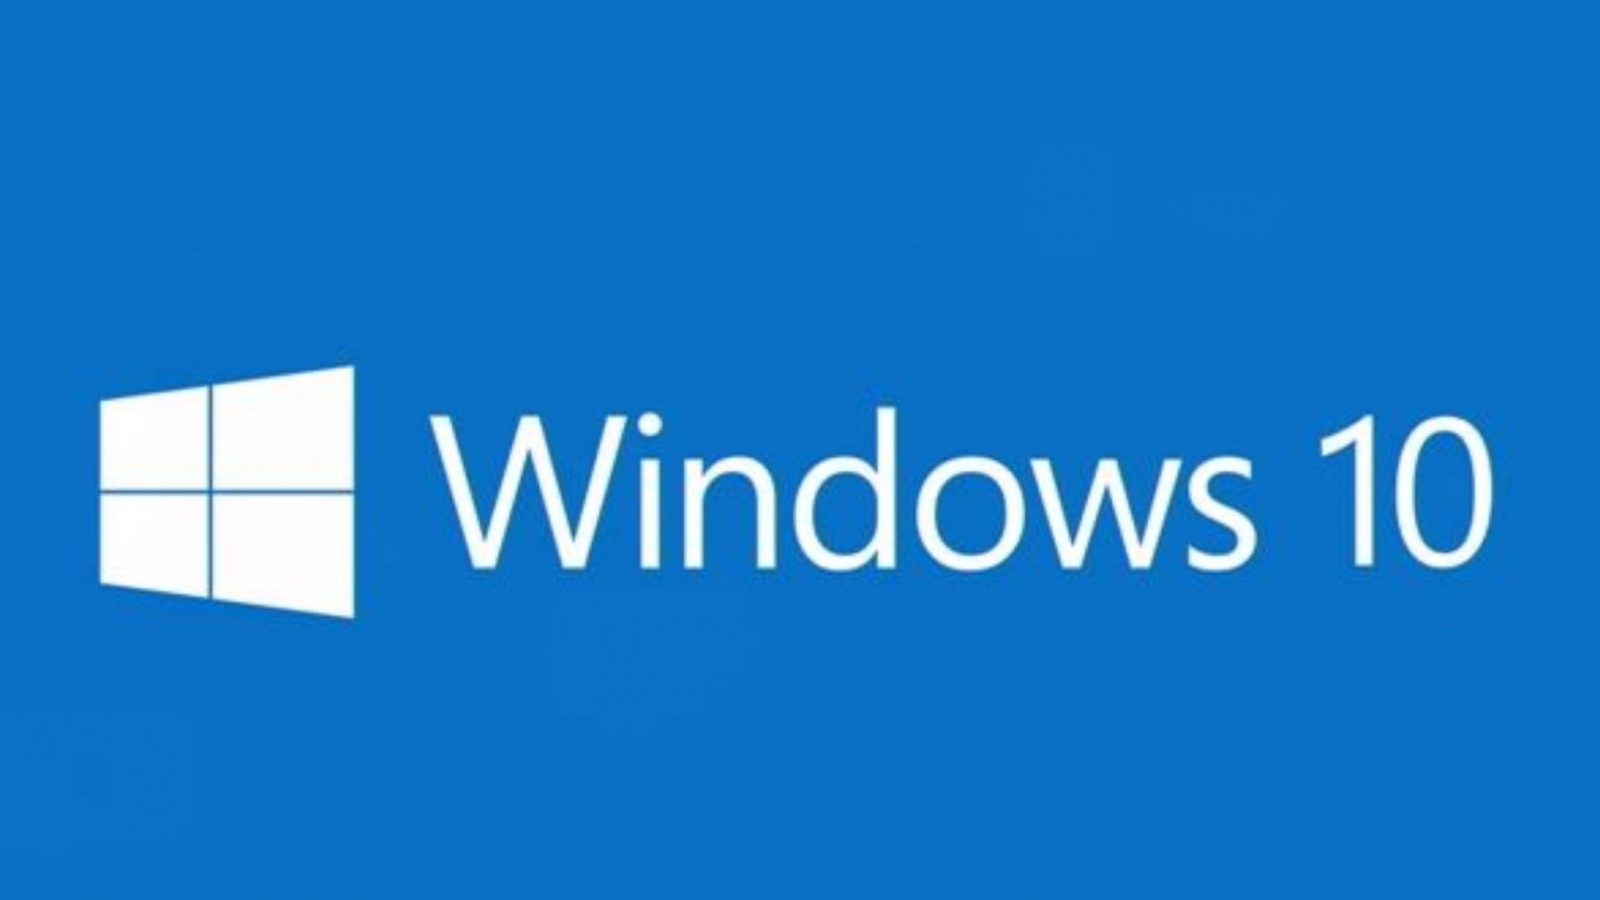 Free download 2560x1024 Wallpaper windows 10 technical